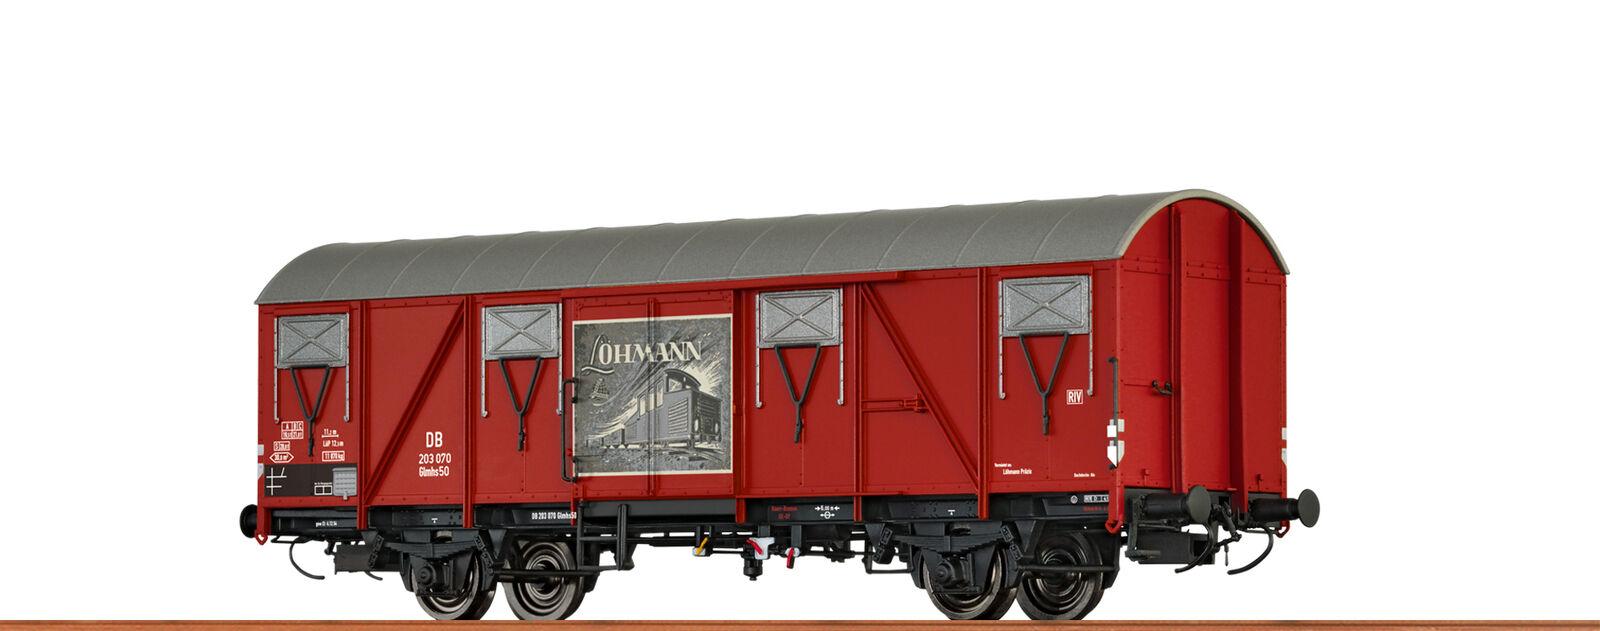 Brawa 47279 Gauge H0 Freight Car Train 50 Db, III, Löhmann Dc